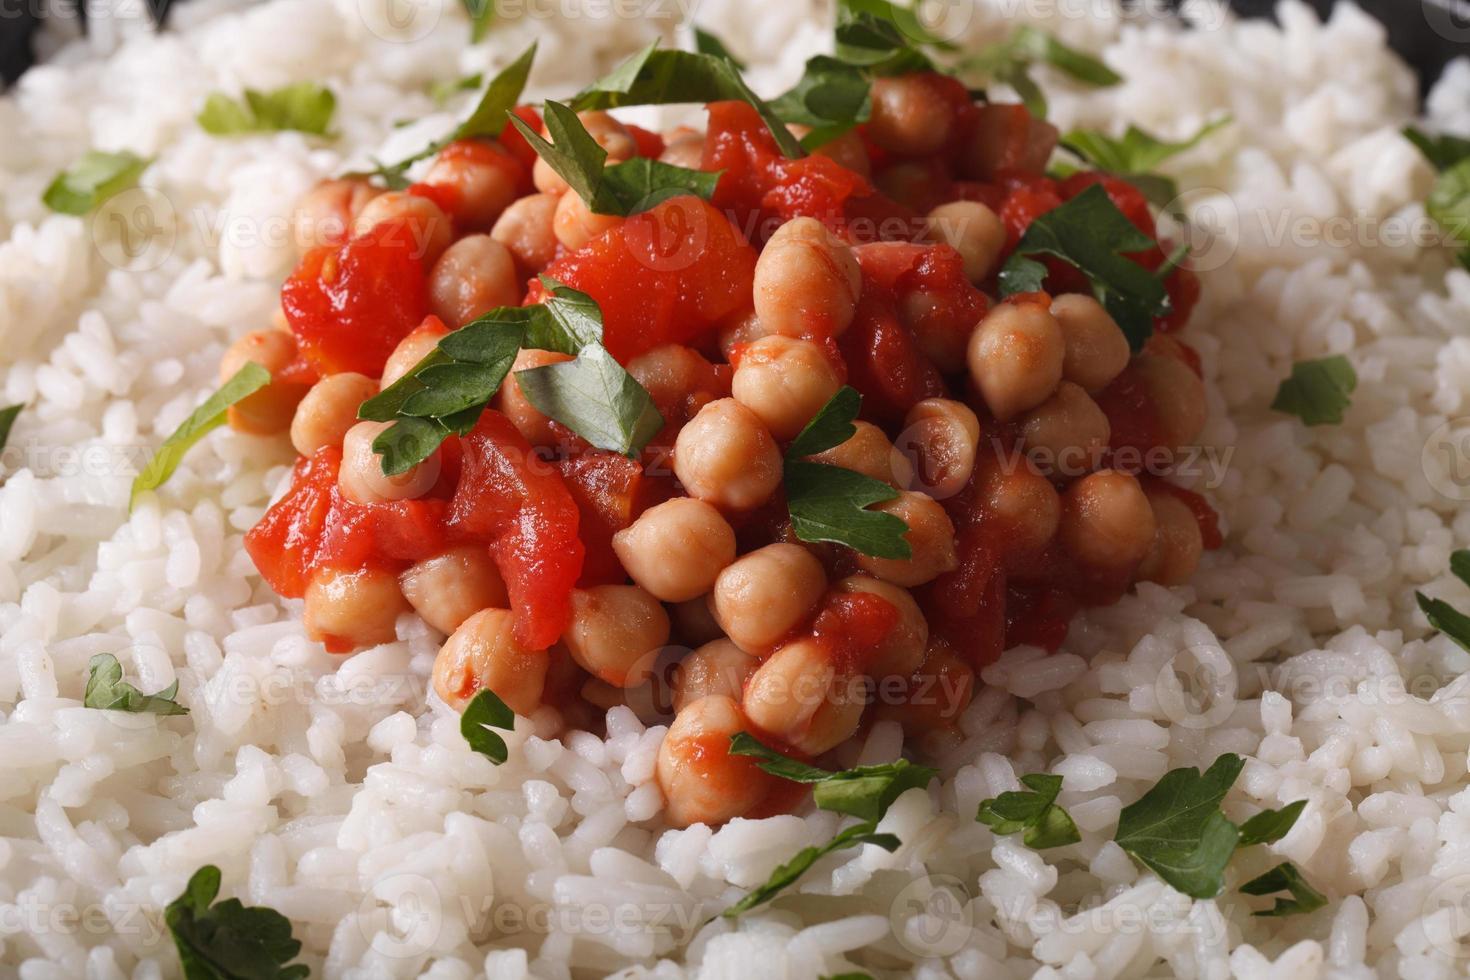 rijst met kikkererwtenkerrie en kruiden macroachtergrond foto